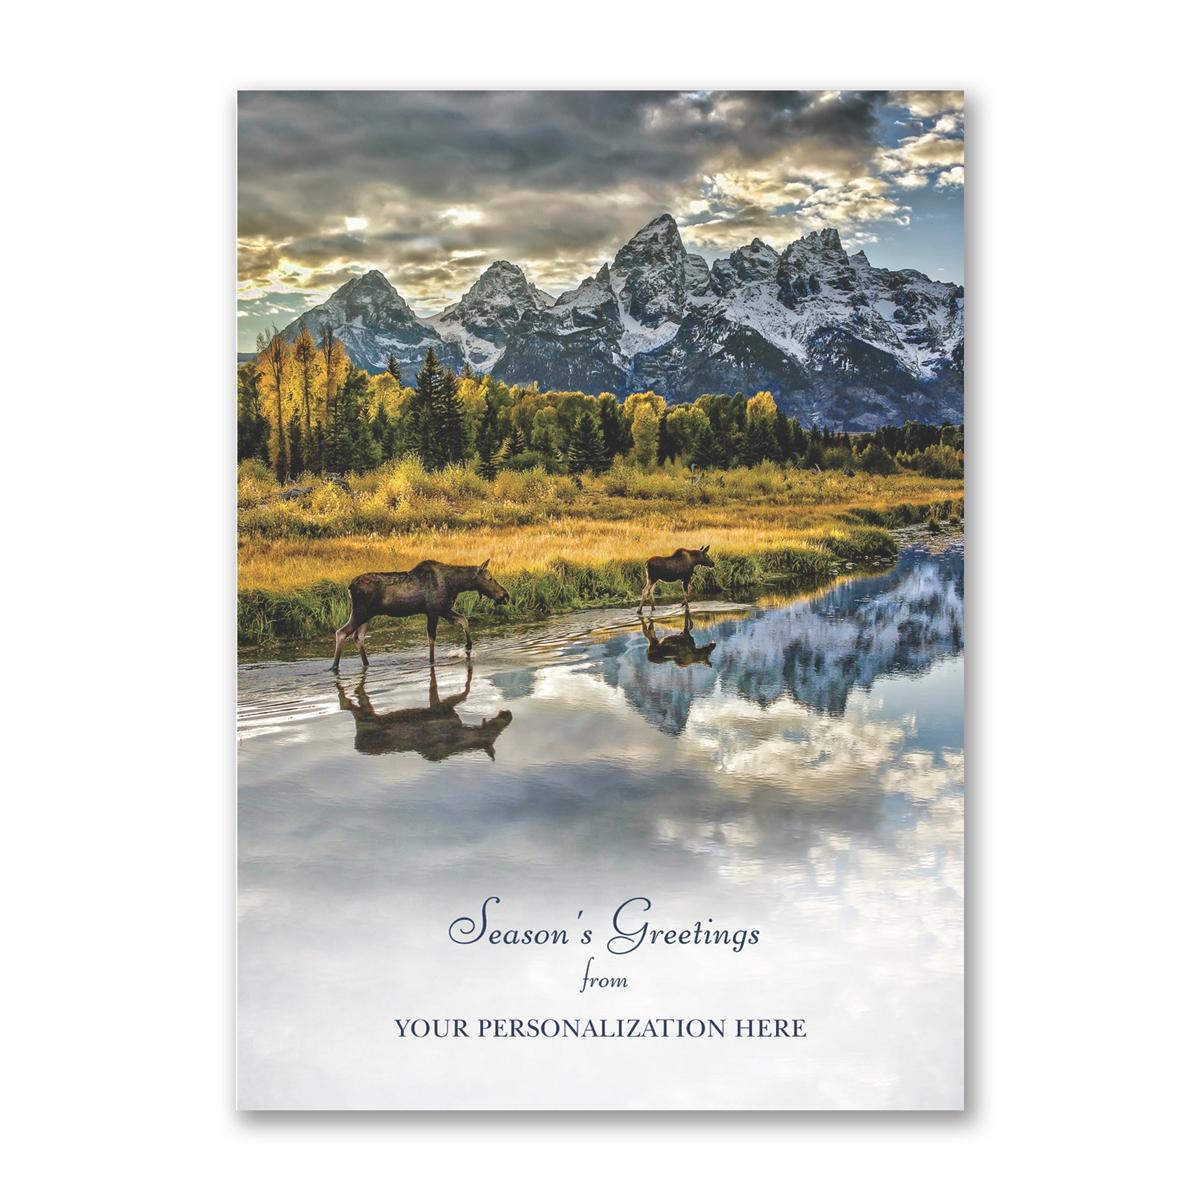 Schwabacher Landing Holiday Cards